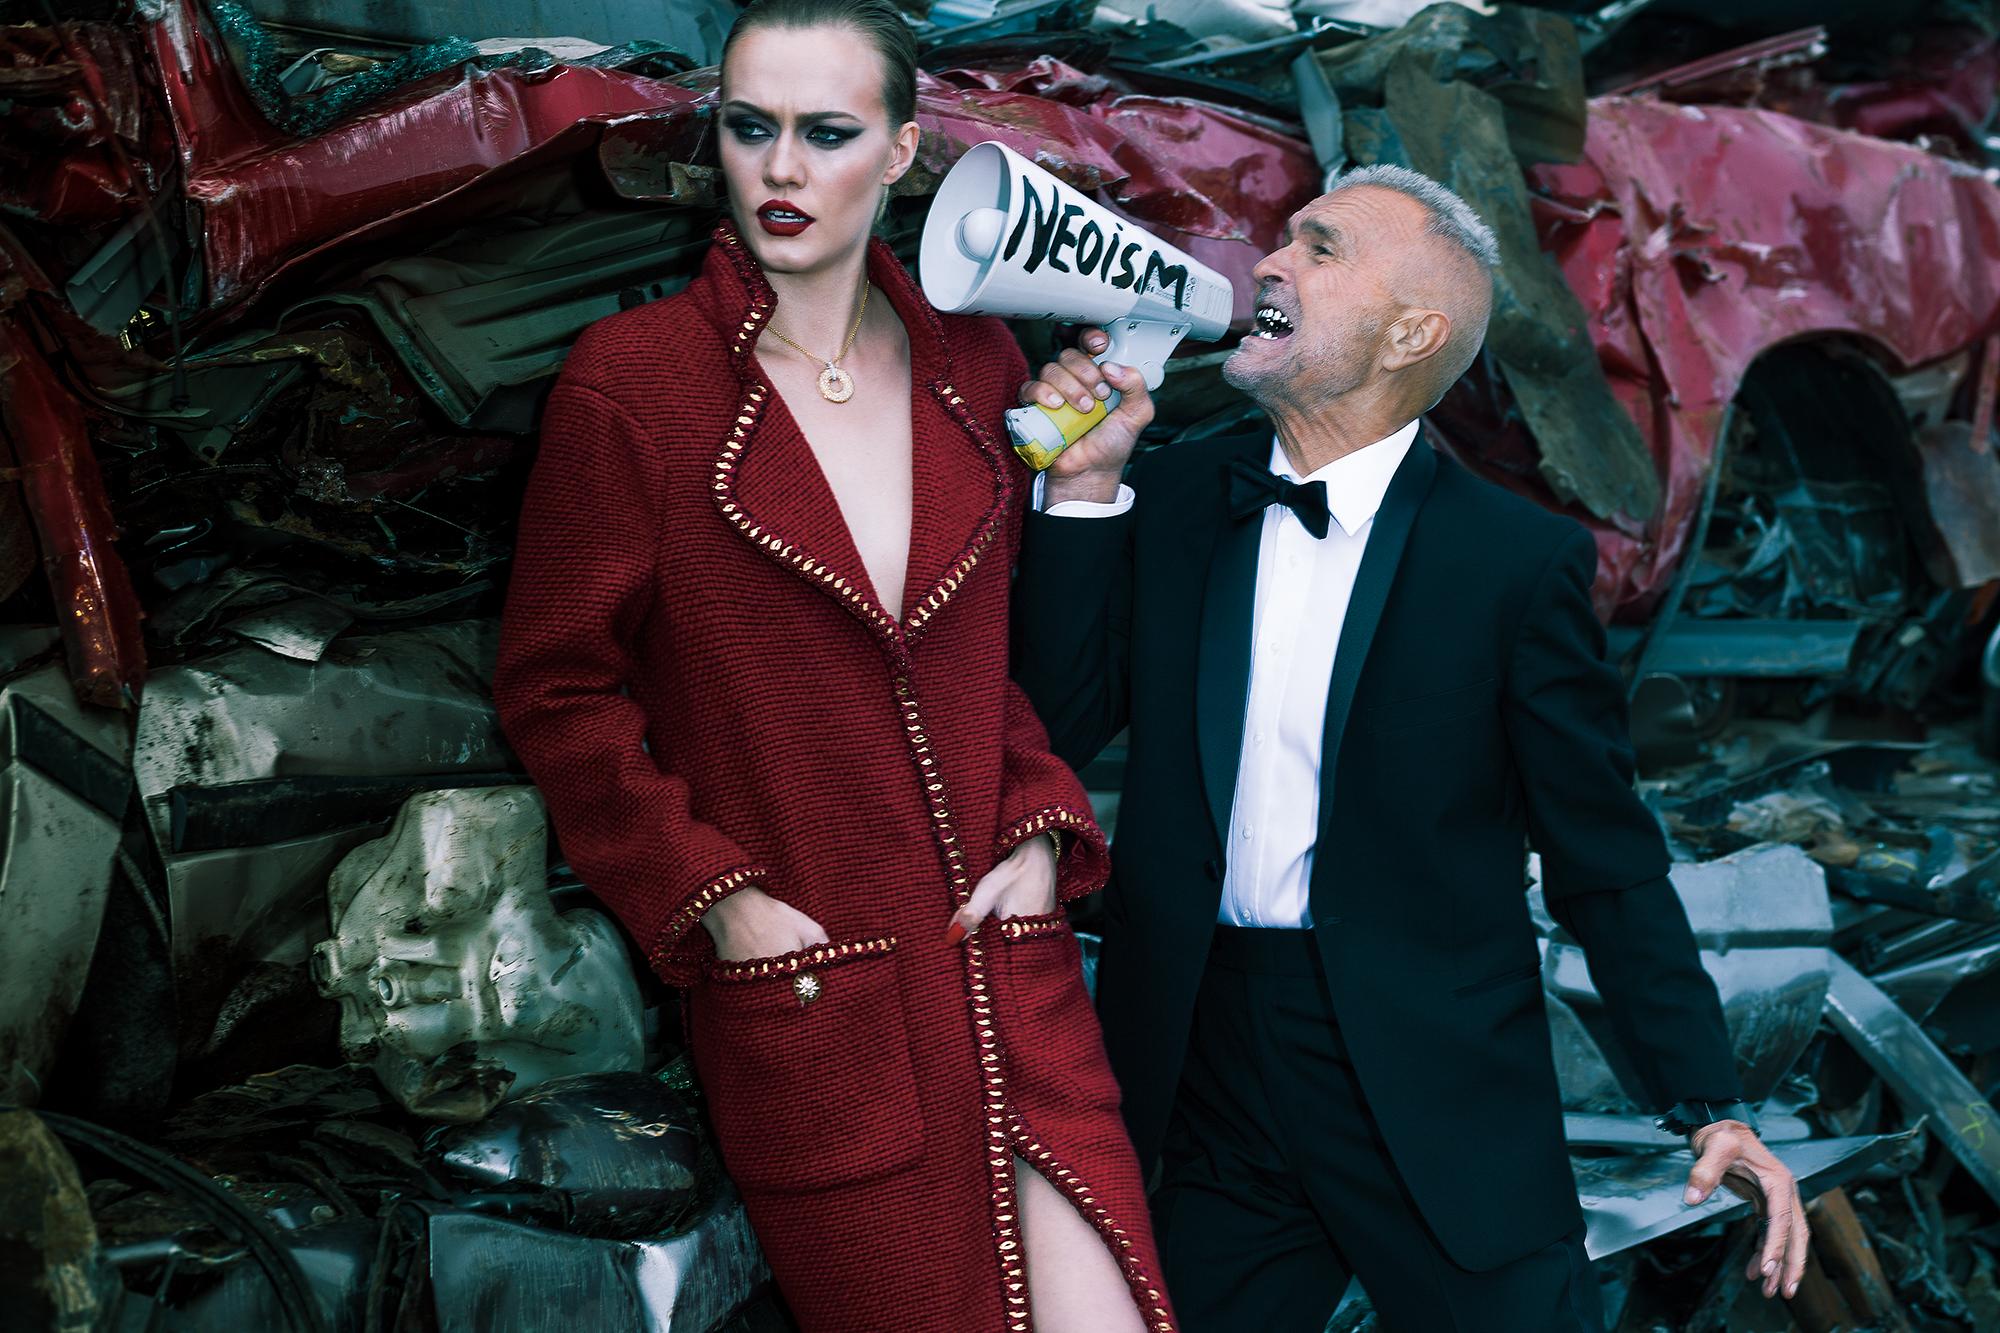 On Katrina: Necklace BIRKS. Coat CHANEL. On Monty: Tuxedo WAXMAN.